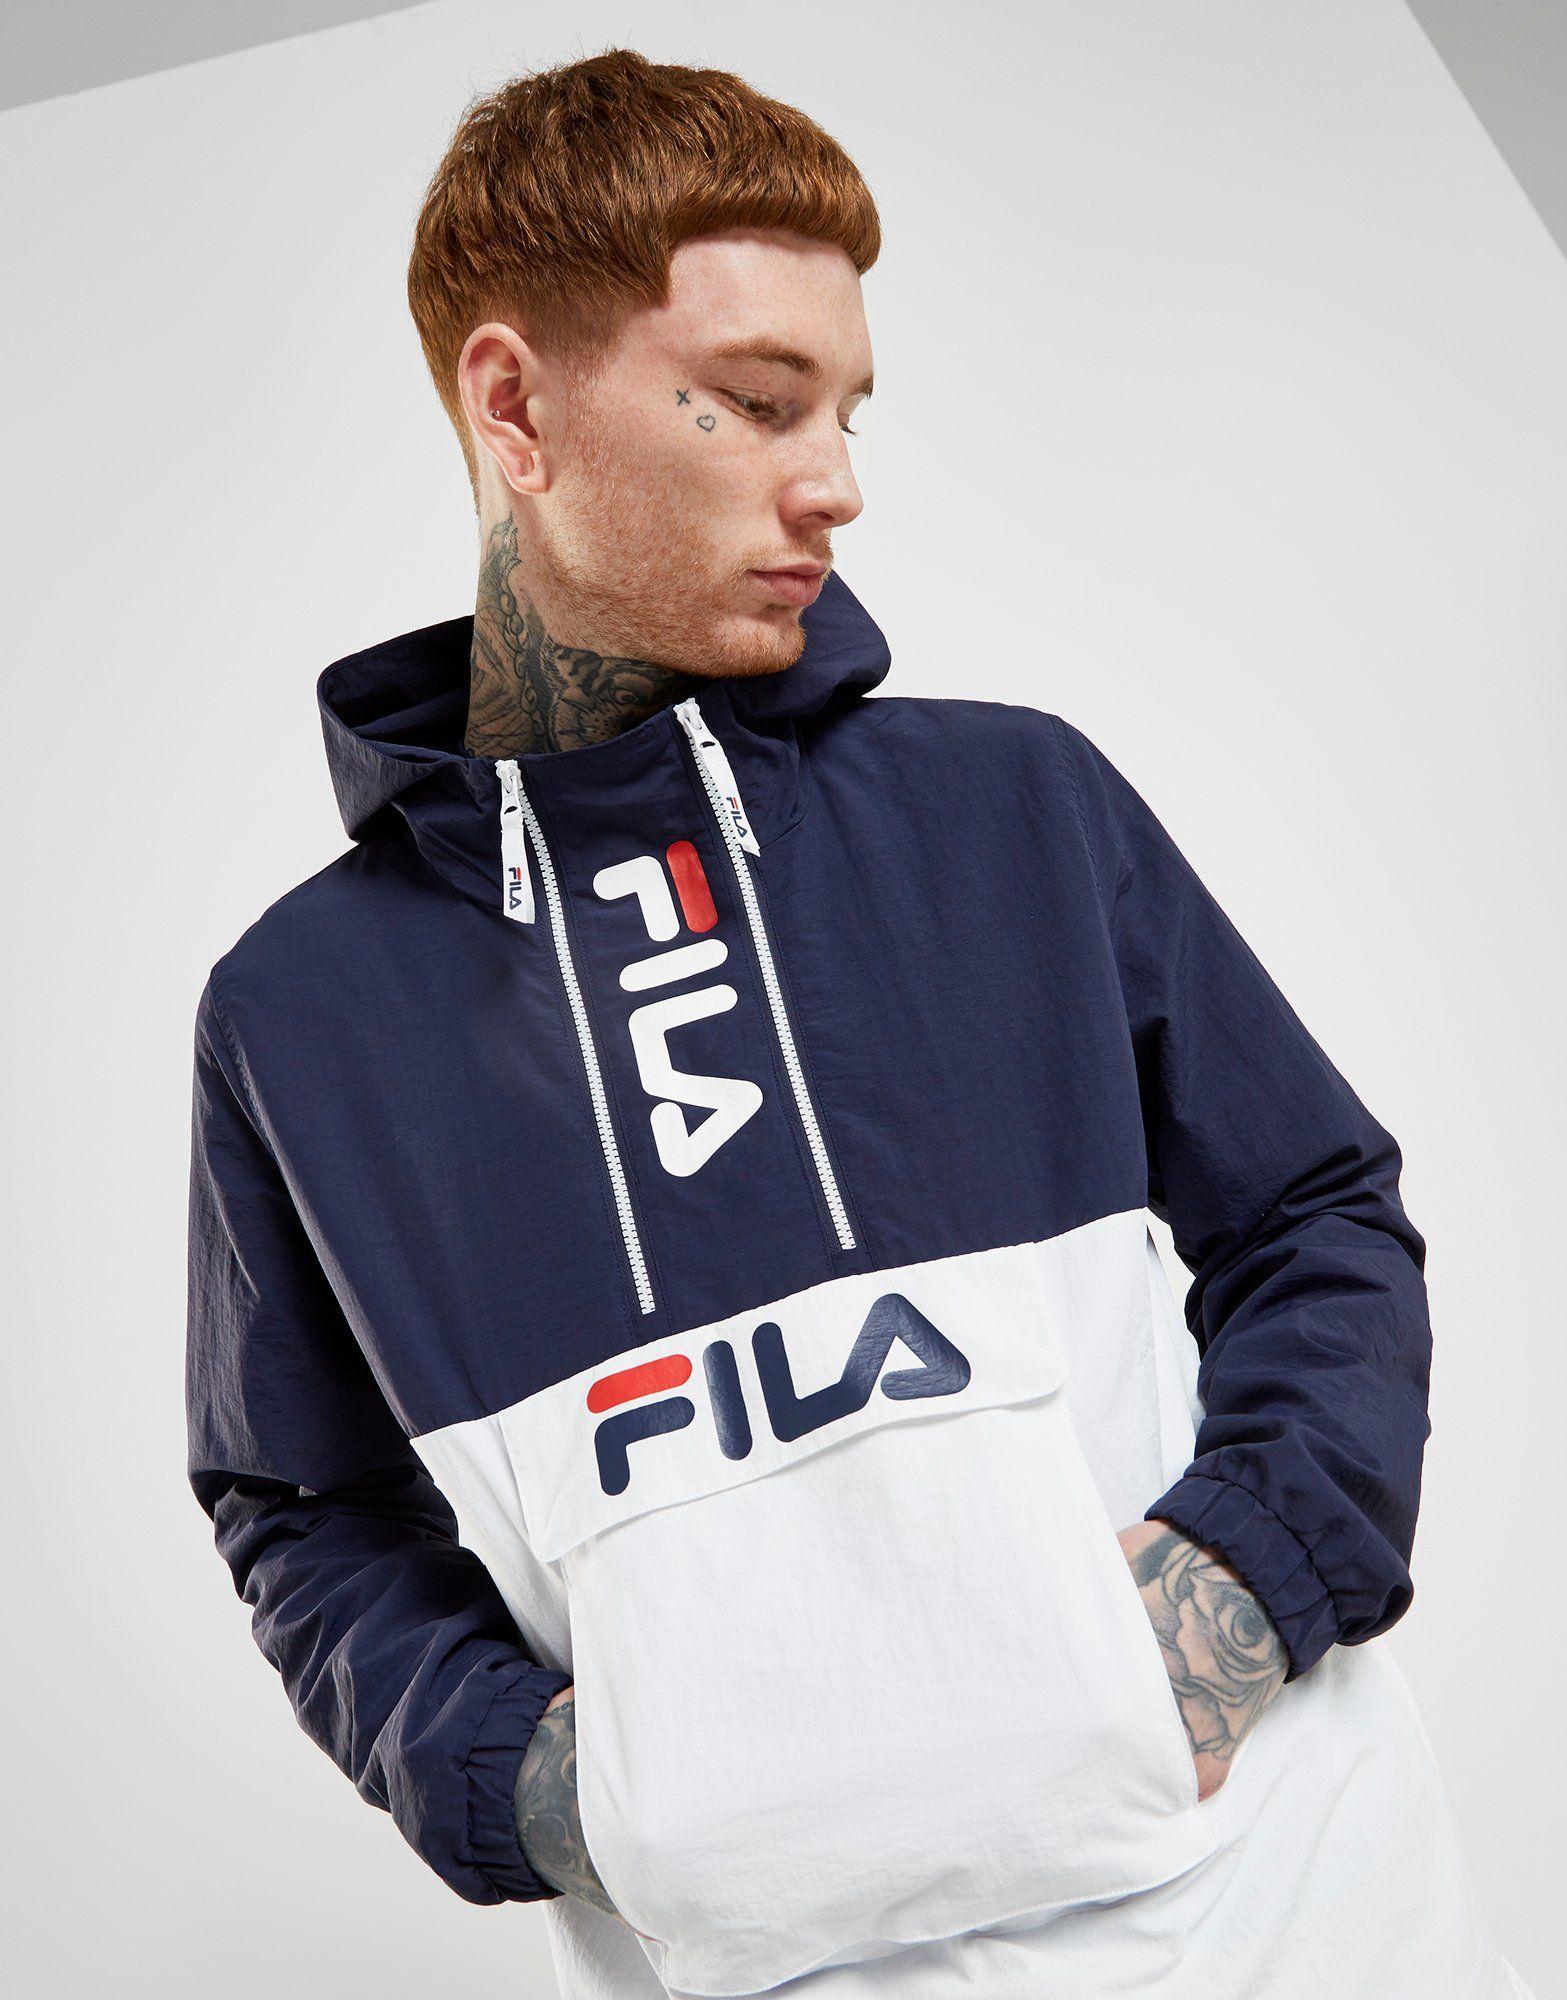 Fila Gilder Lightweight Jacket